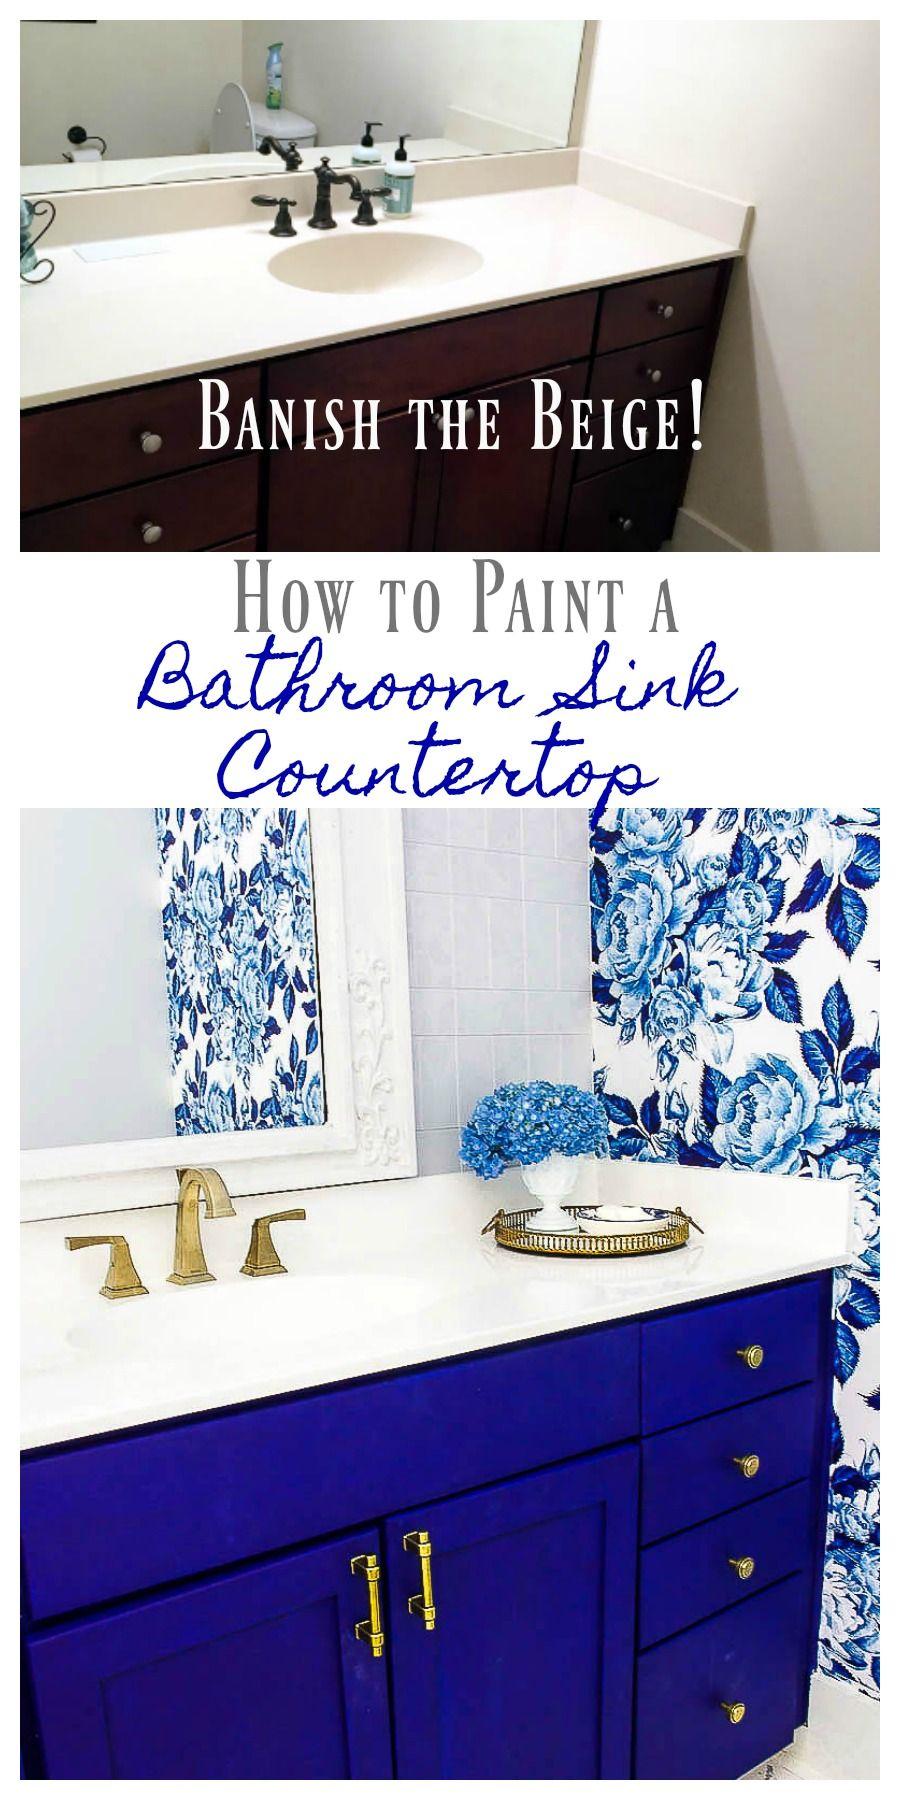 Diy Painted Bathroom Countertop And Sink 2 Bees In A Pod Painting Bathroom Beige Bathroom Bathroom Vanity Makeover [ 1800 x 900 Pixel ]